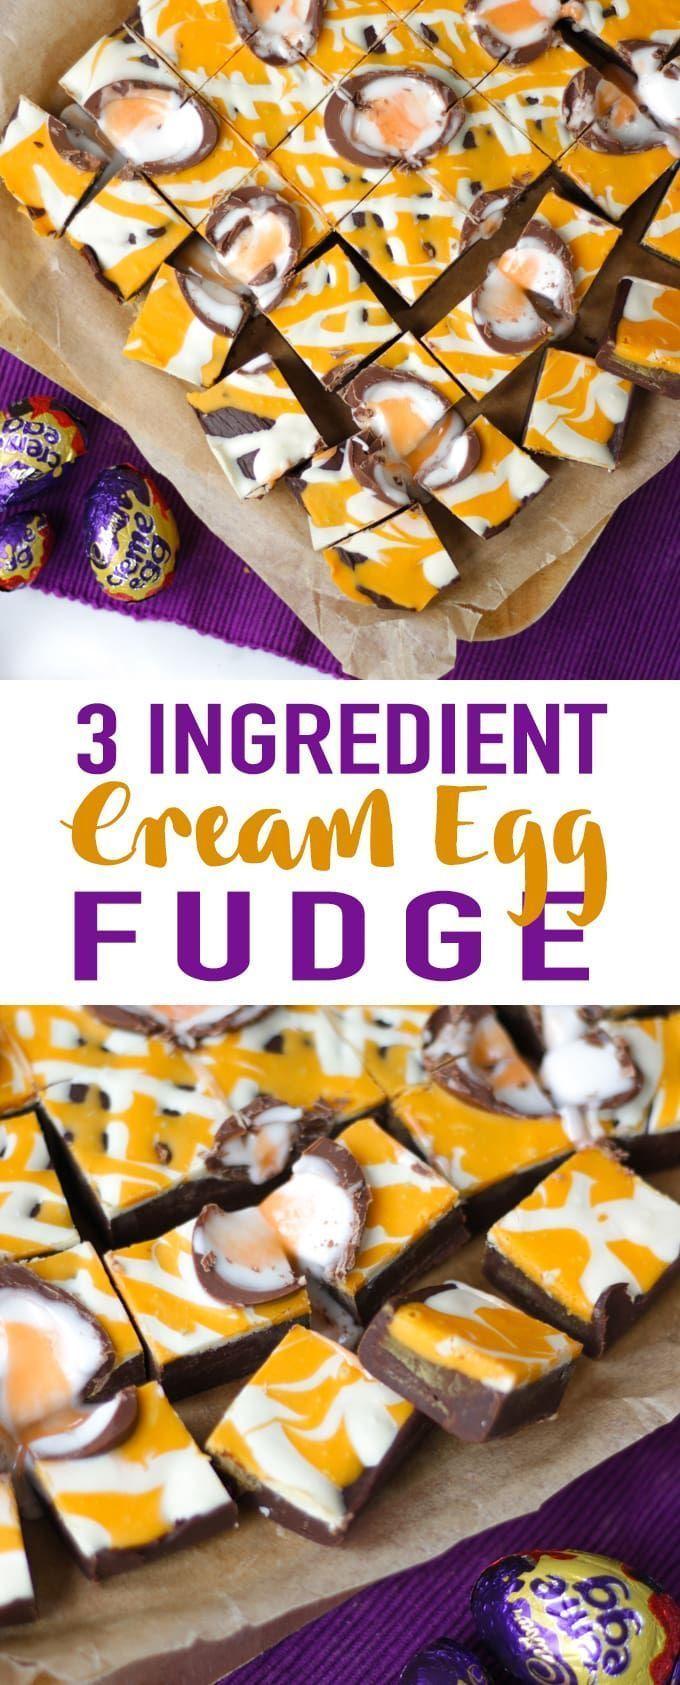 Slow Cooker Creme Egg Fudge Recipe Slow Cooker Fudge Fudge Recipes Slow Cooker Desserts